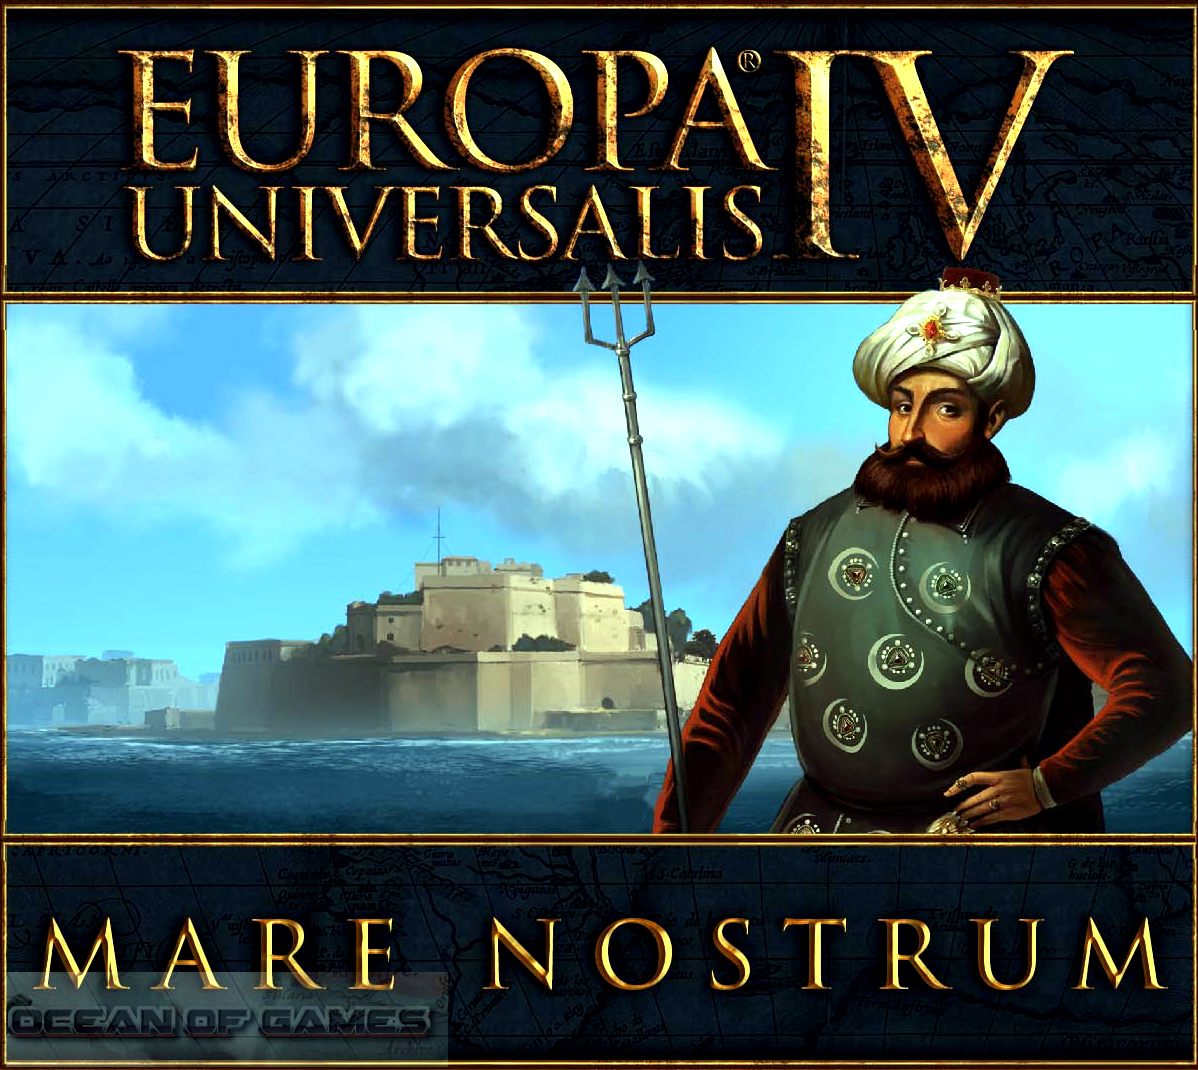 Europa Universalis IV Mare Nostrum Free Download